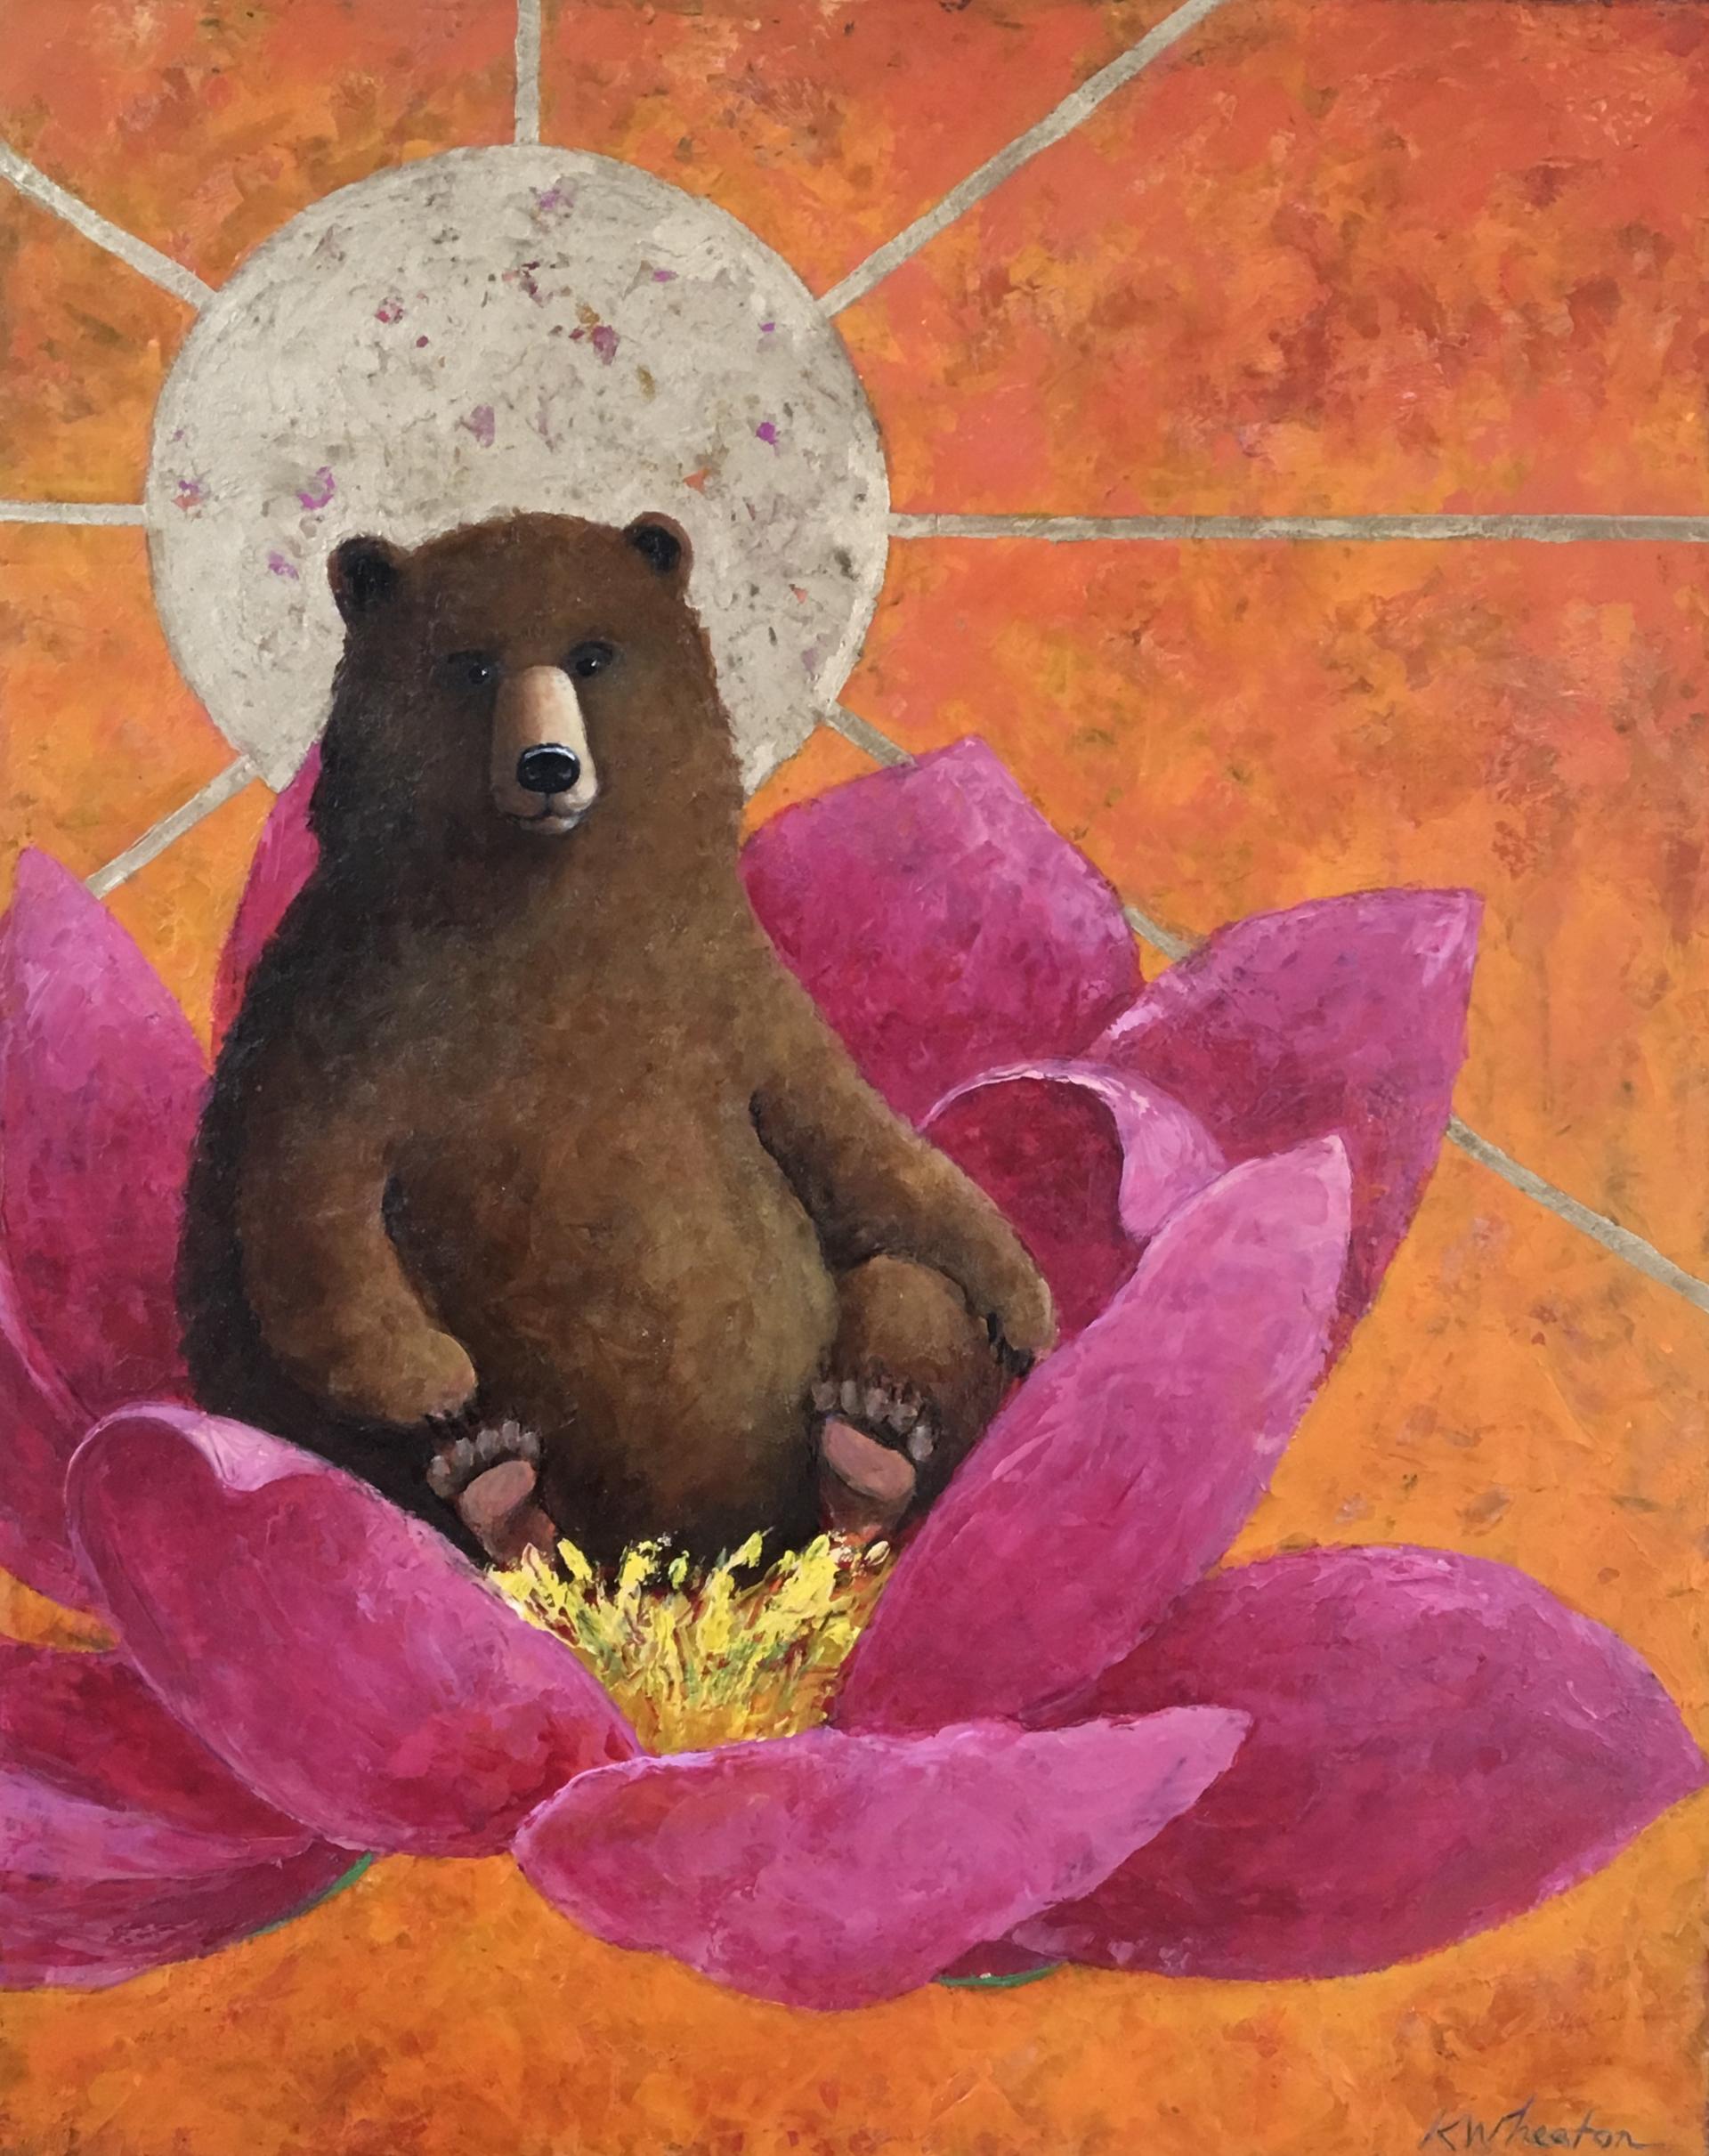 The Bear Abides by Kimberly Wheaton